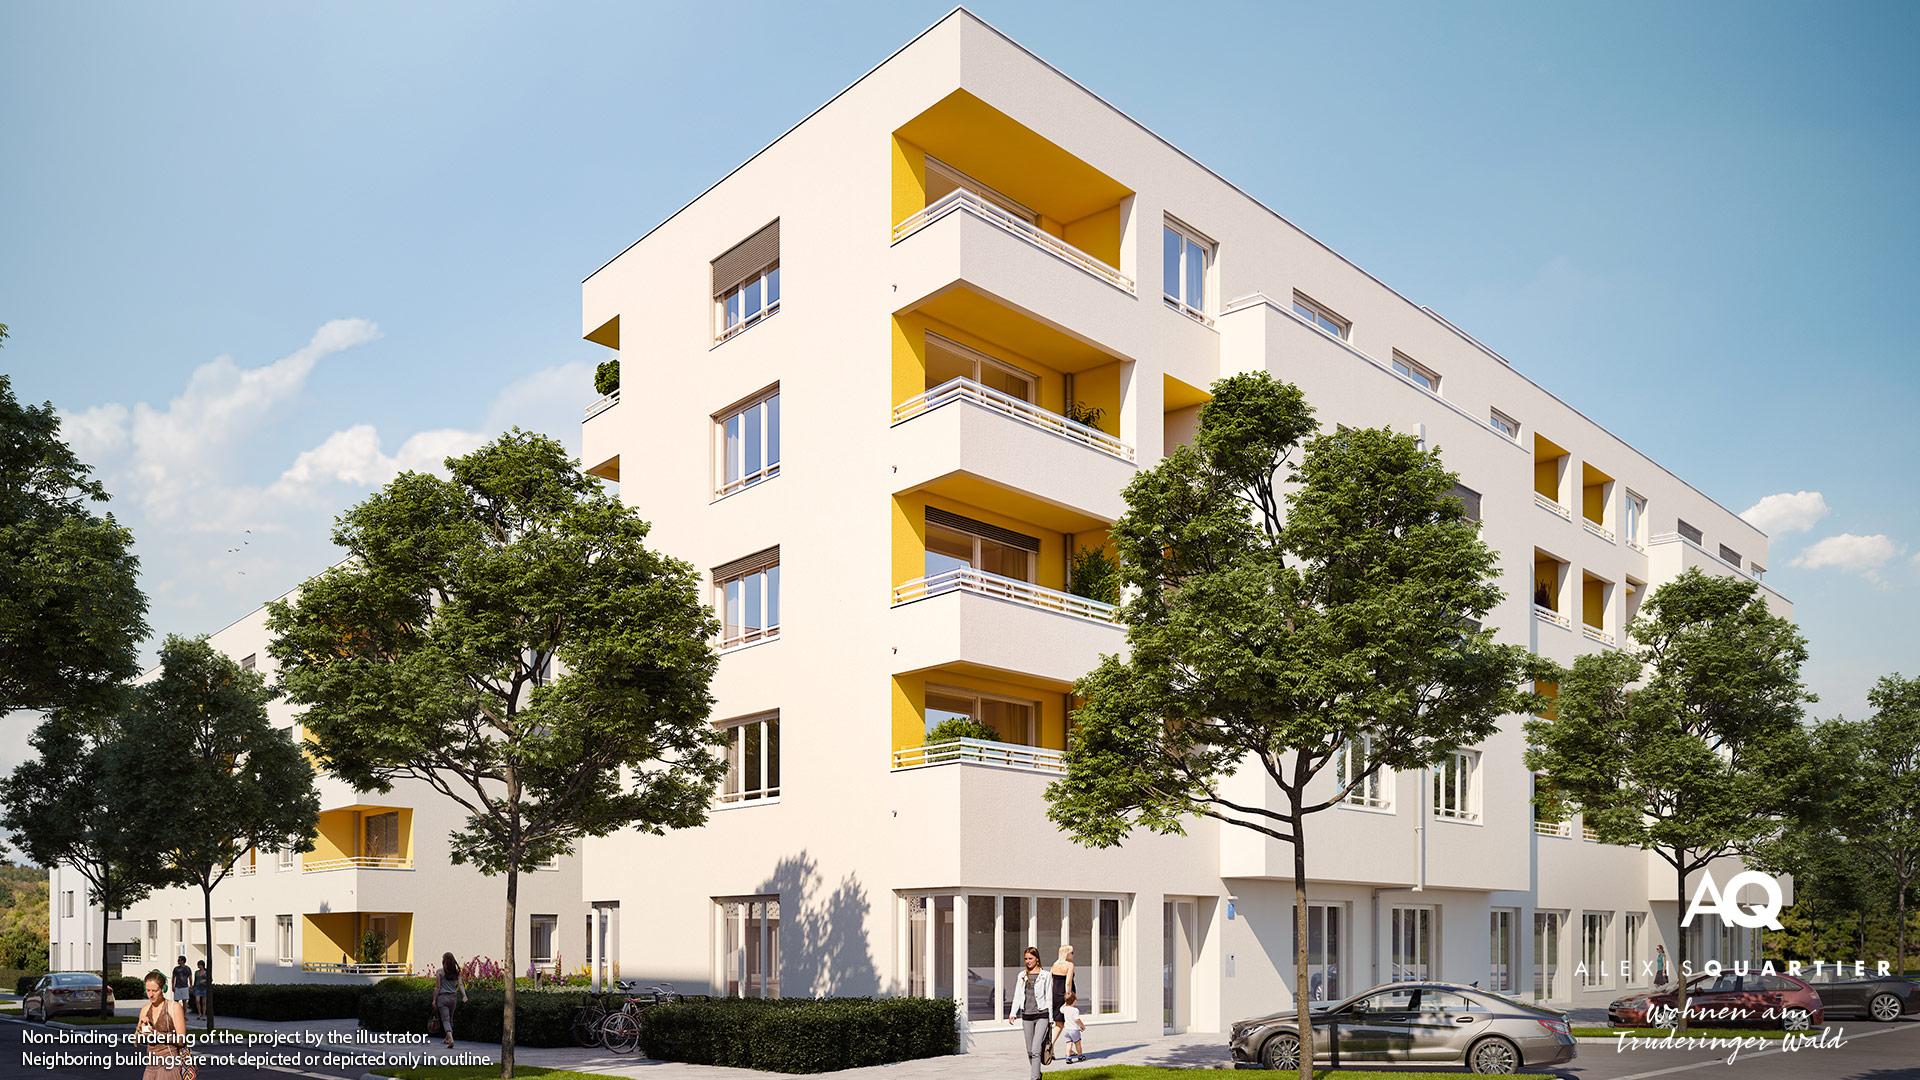 Property Alexisquartier Wohnen am Truderinger Wald - Illustration 2